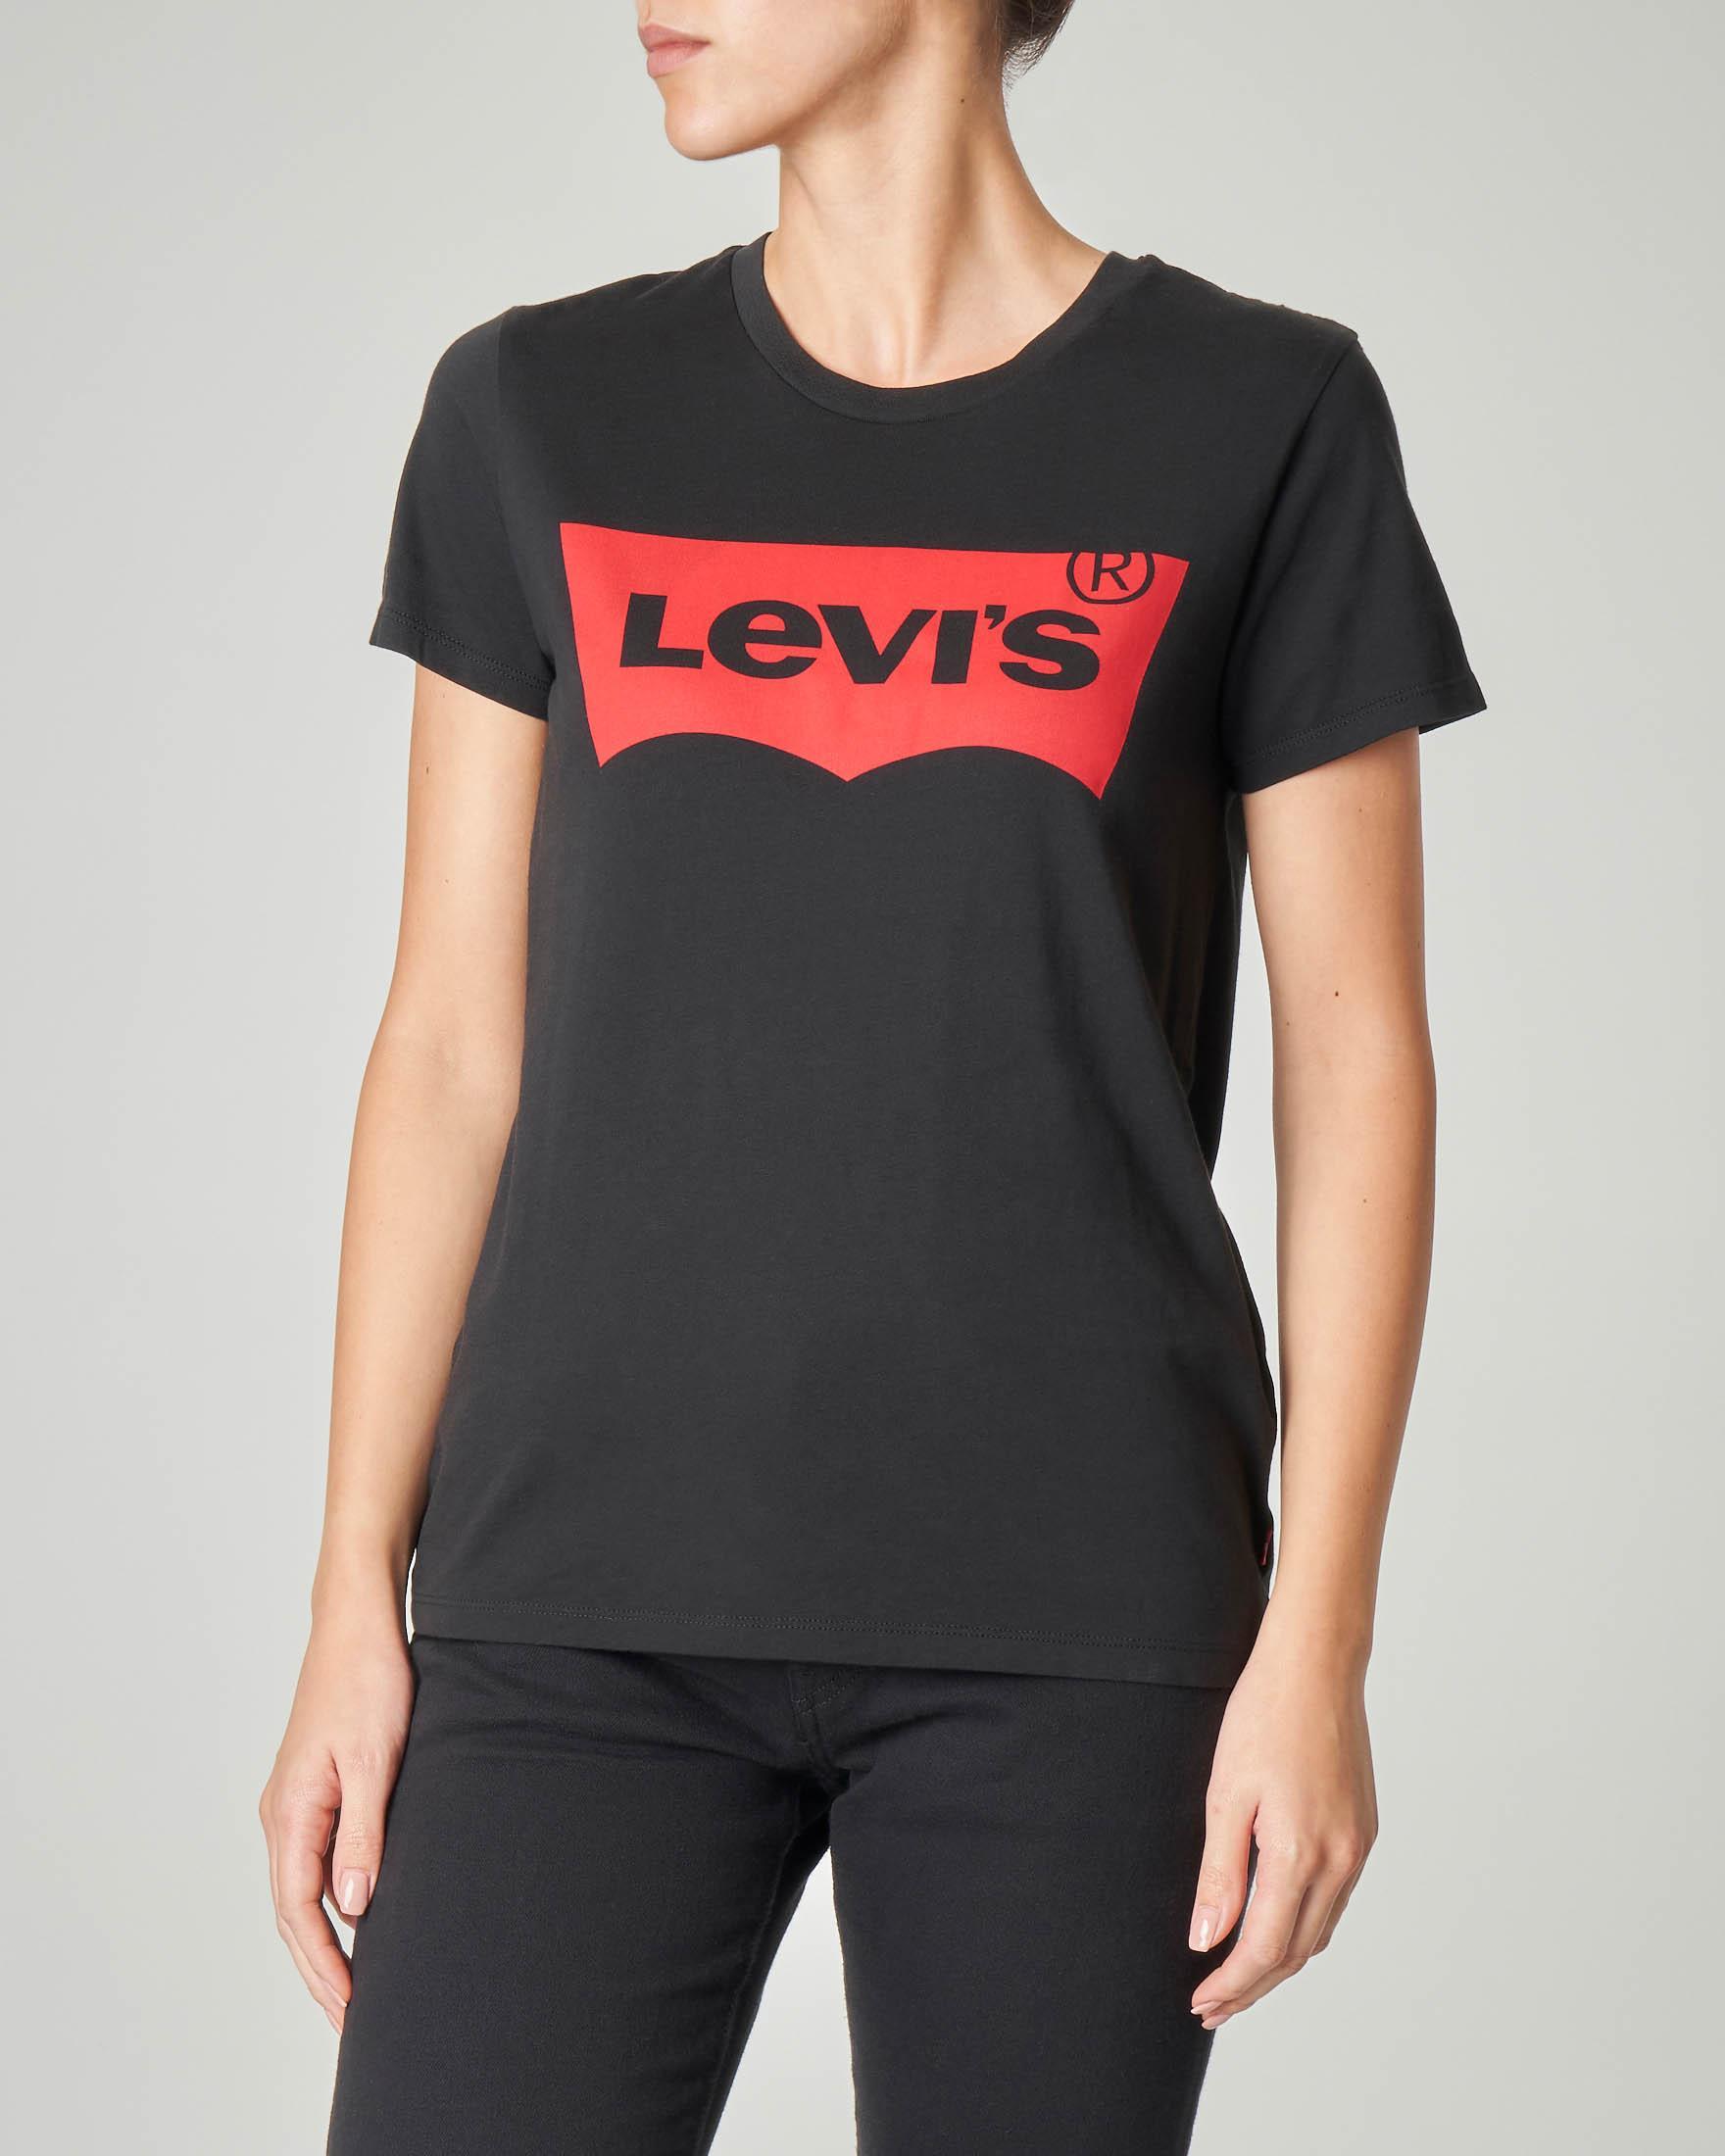 T-shirt in cotone nera con batwing rosso stampato